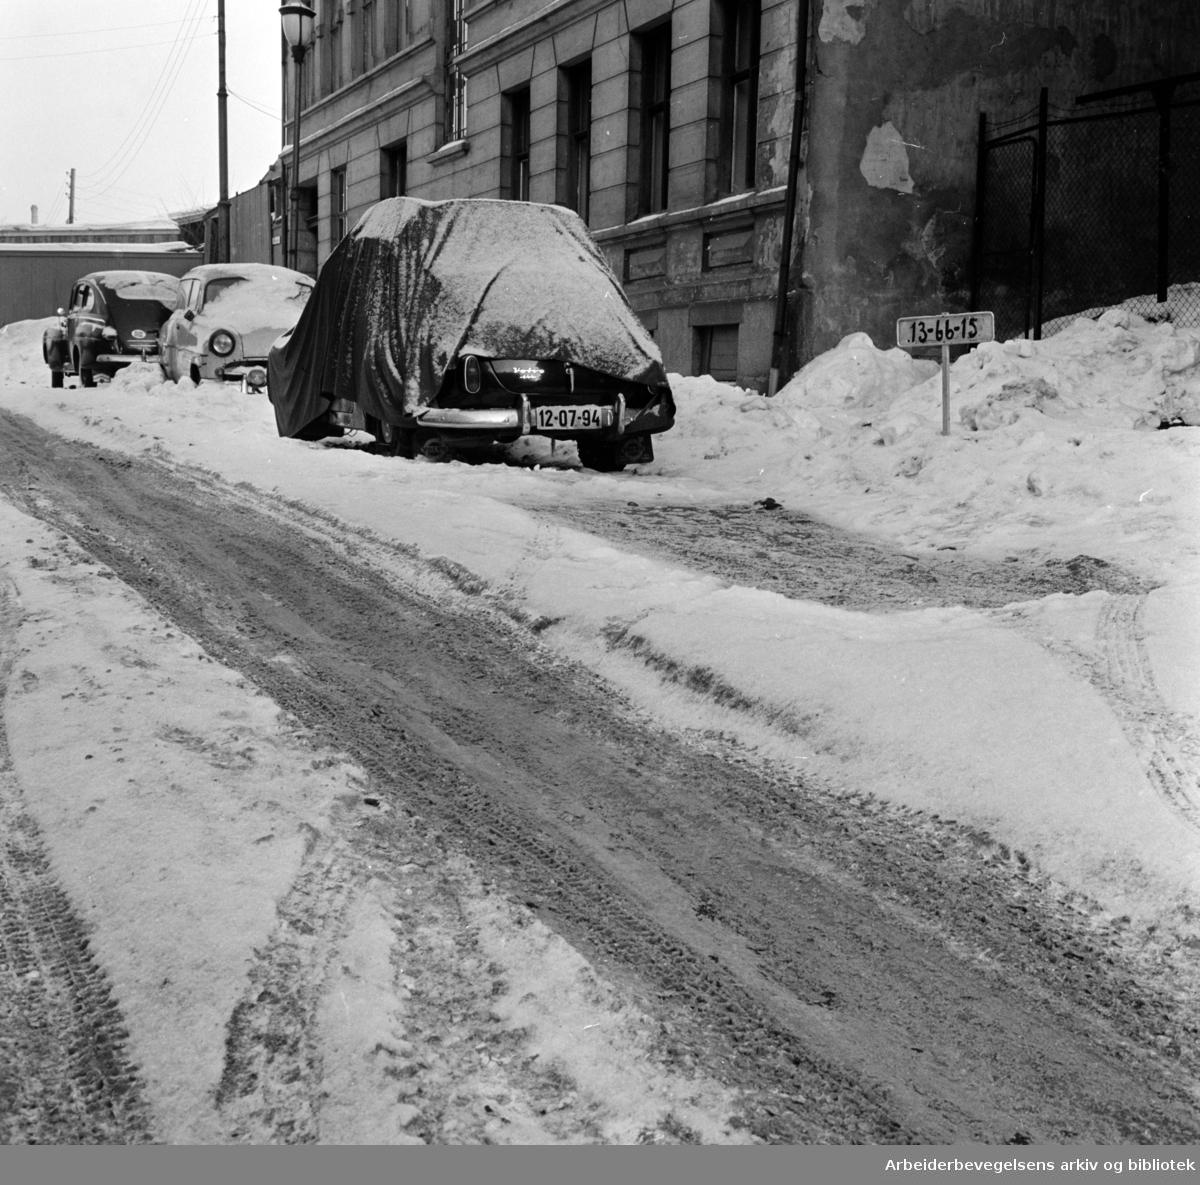 Vestfoldgata. Snøbrøyting uteblir. Februar 1963